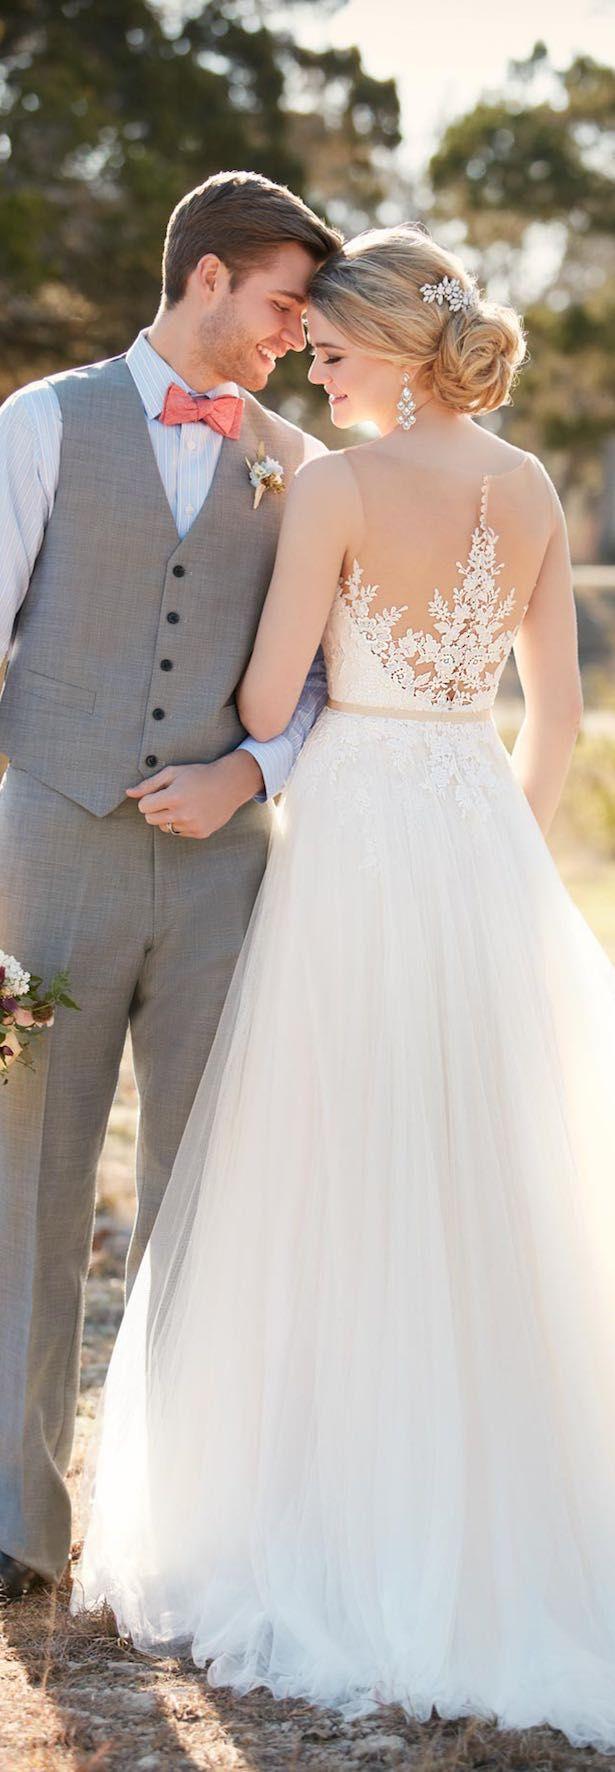 Essense wedding dress  Essense of Australia Fall  in   ethno inspired fashion